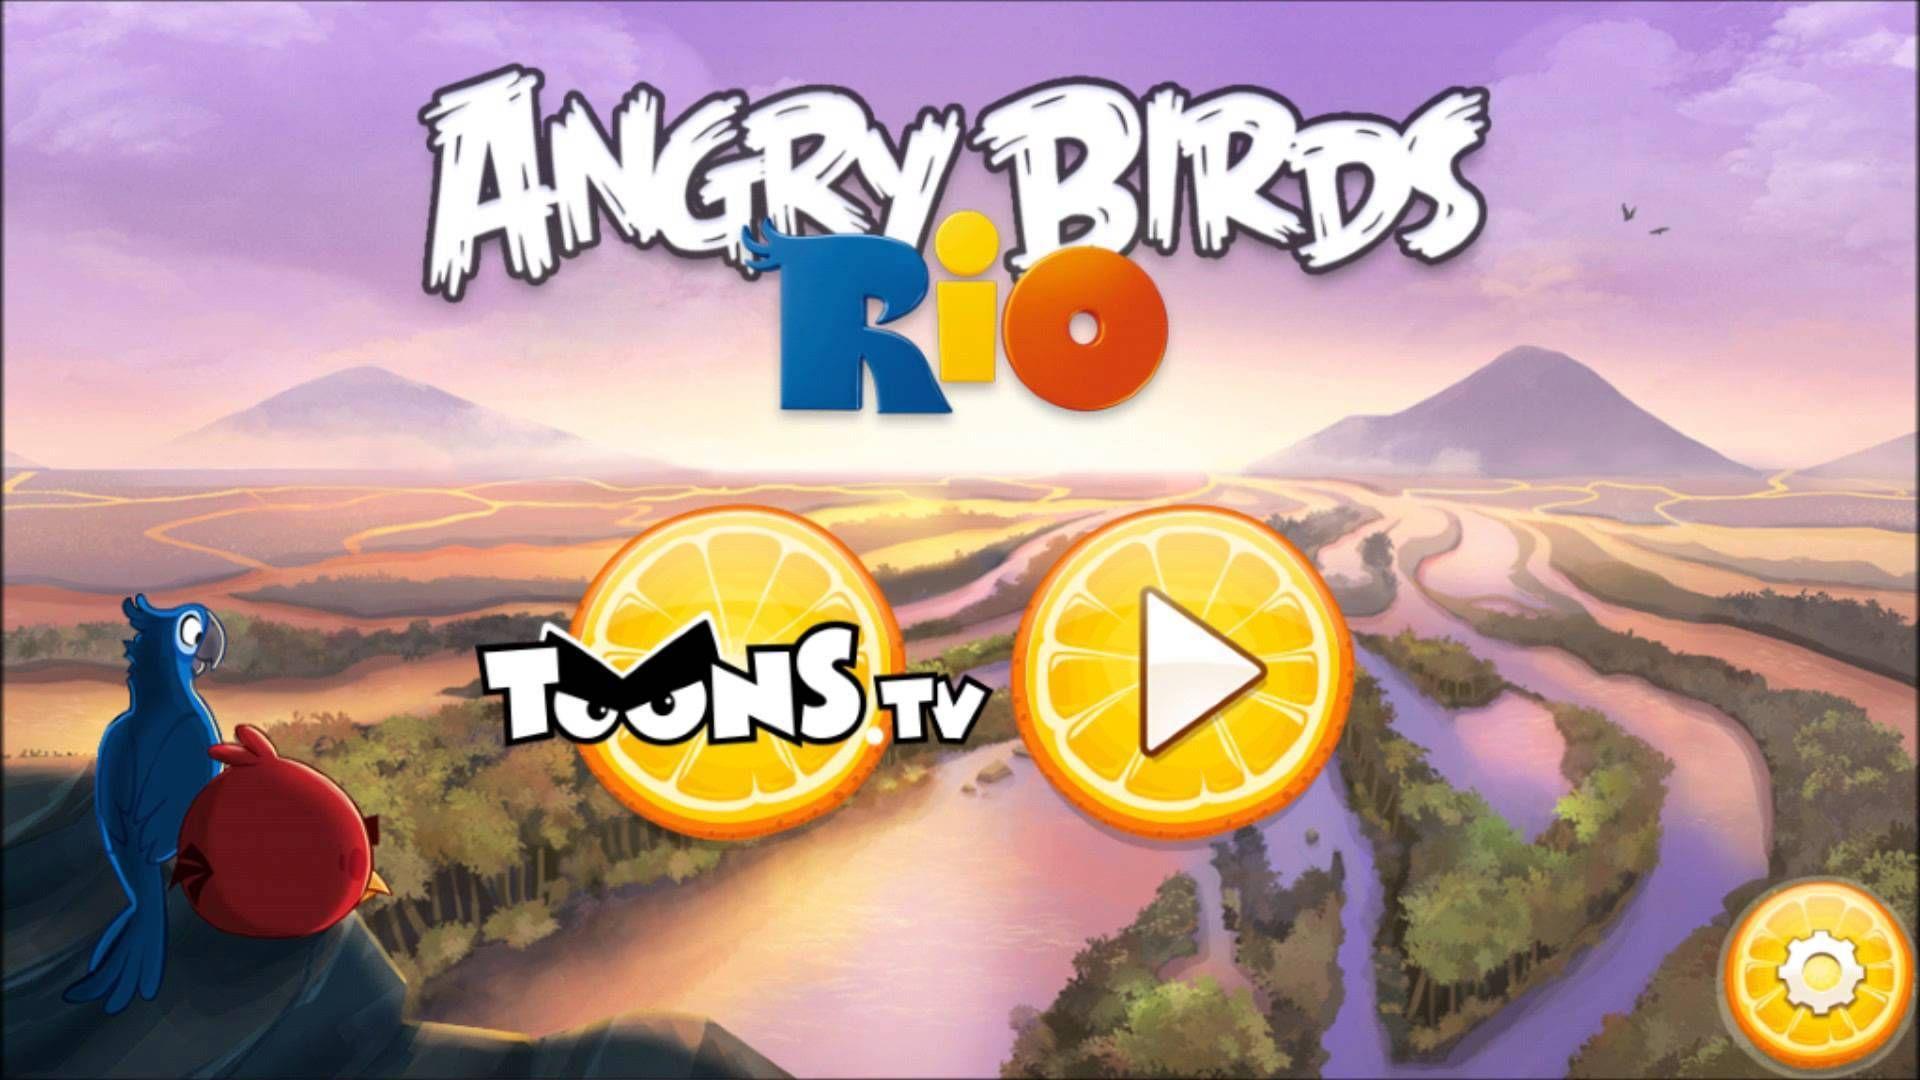 Angry Birds 2 Hack 2018 angry birds rio mod apk: angry birds rio mod apk (mod